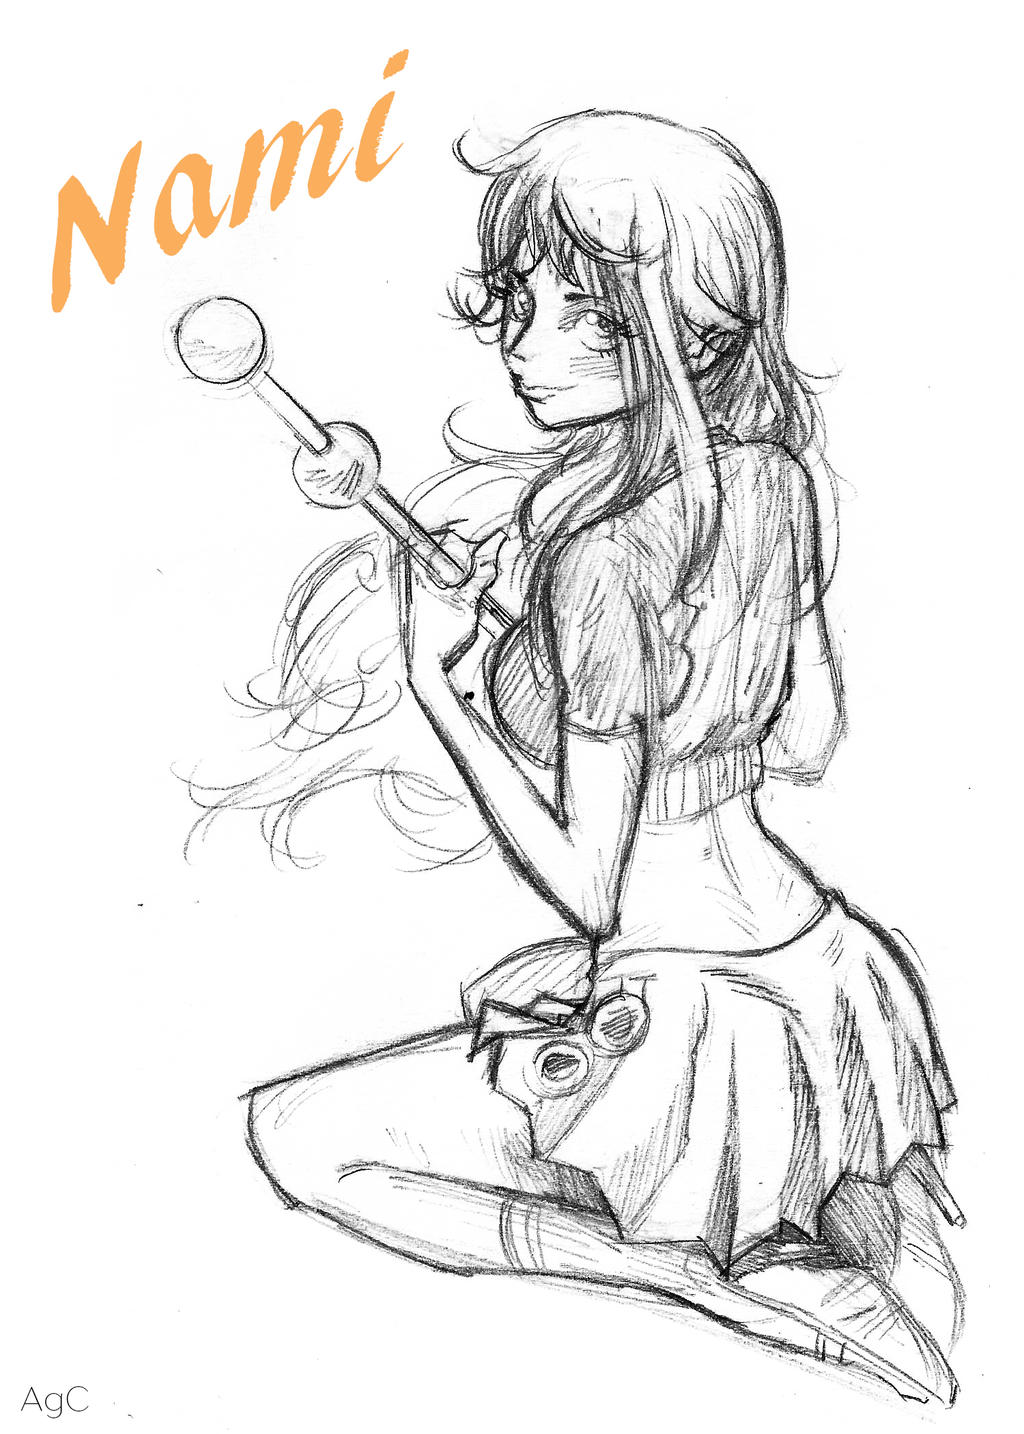 Nami - One Piece - Pencil Sketch 7 By AnthonyGonzalesClark On DeviantArt